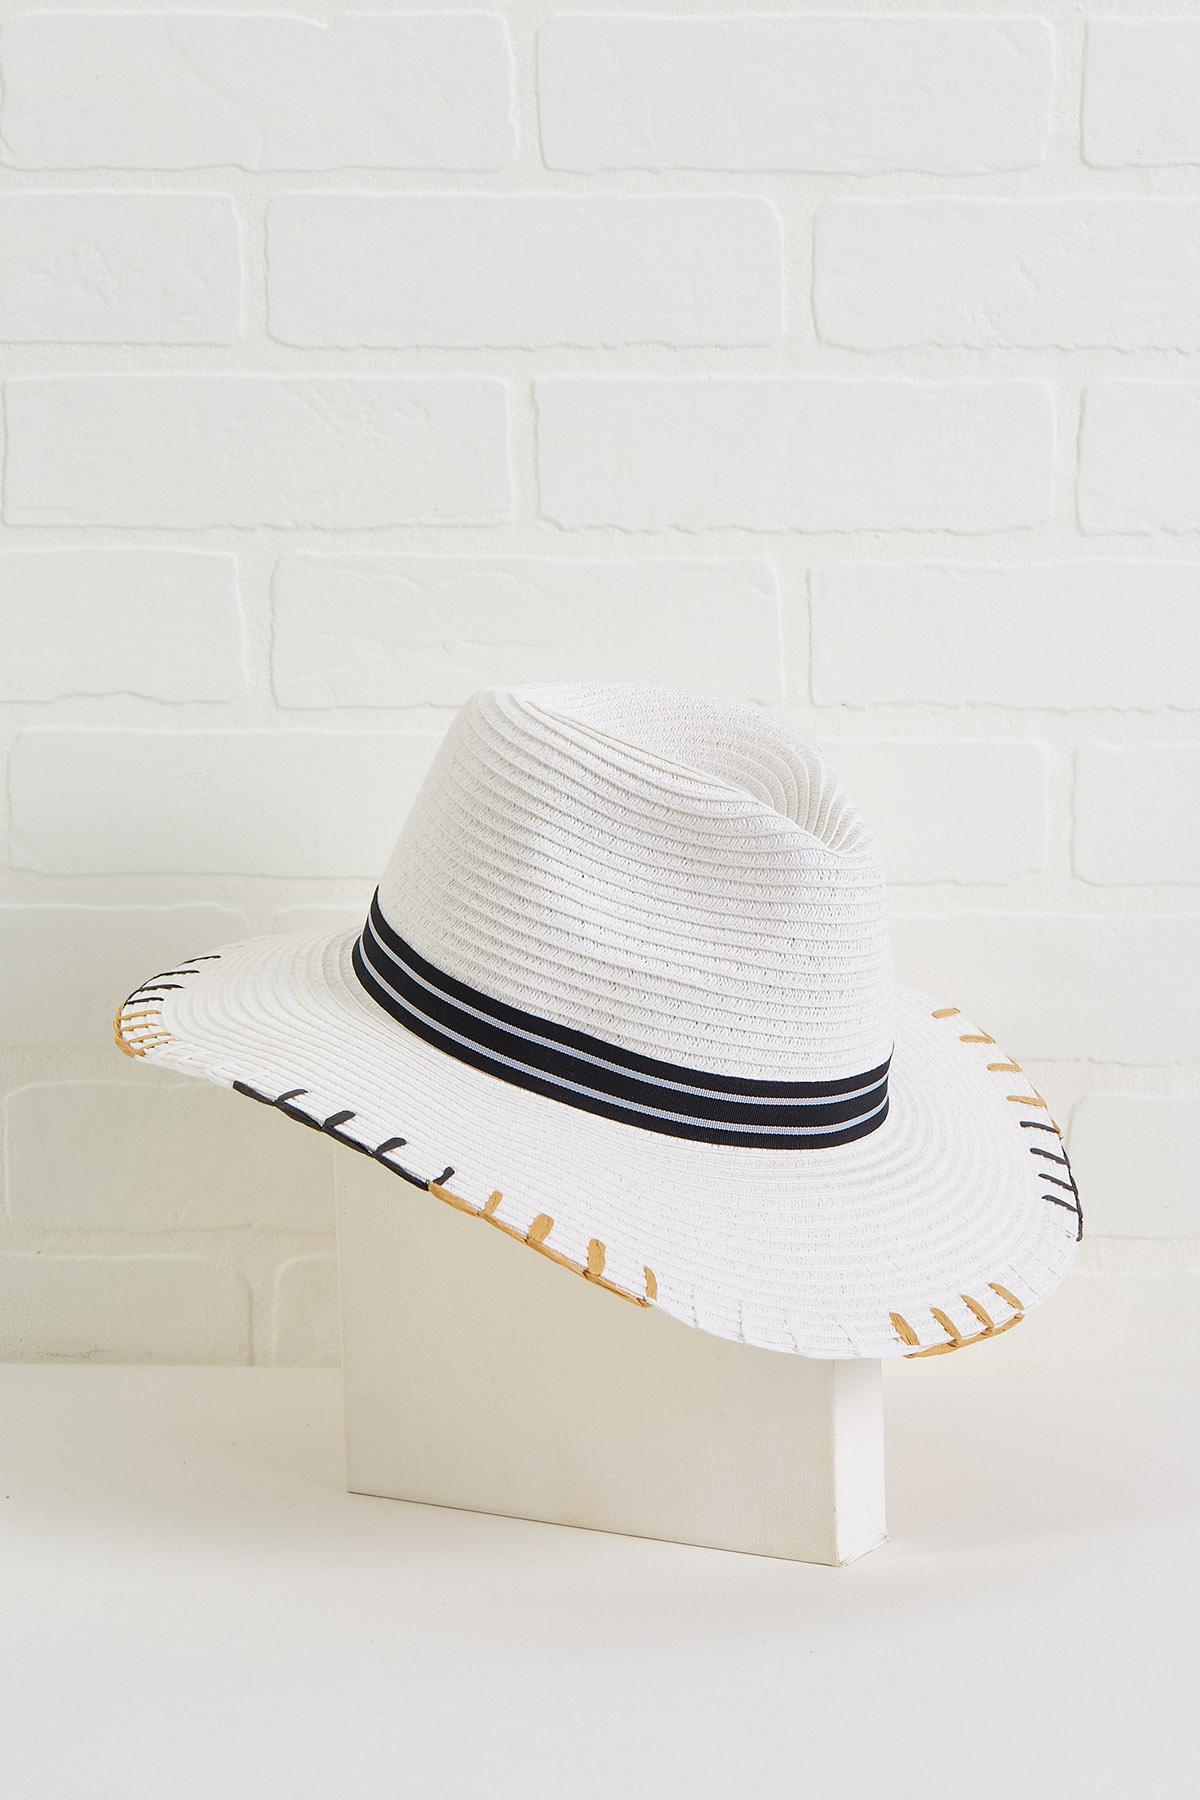 The Last Straw Hat